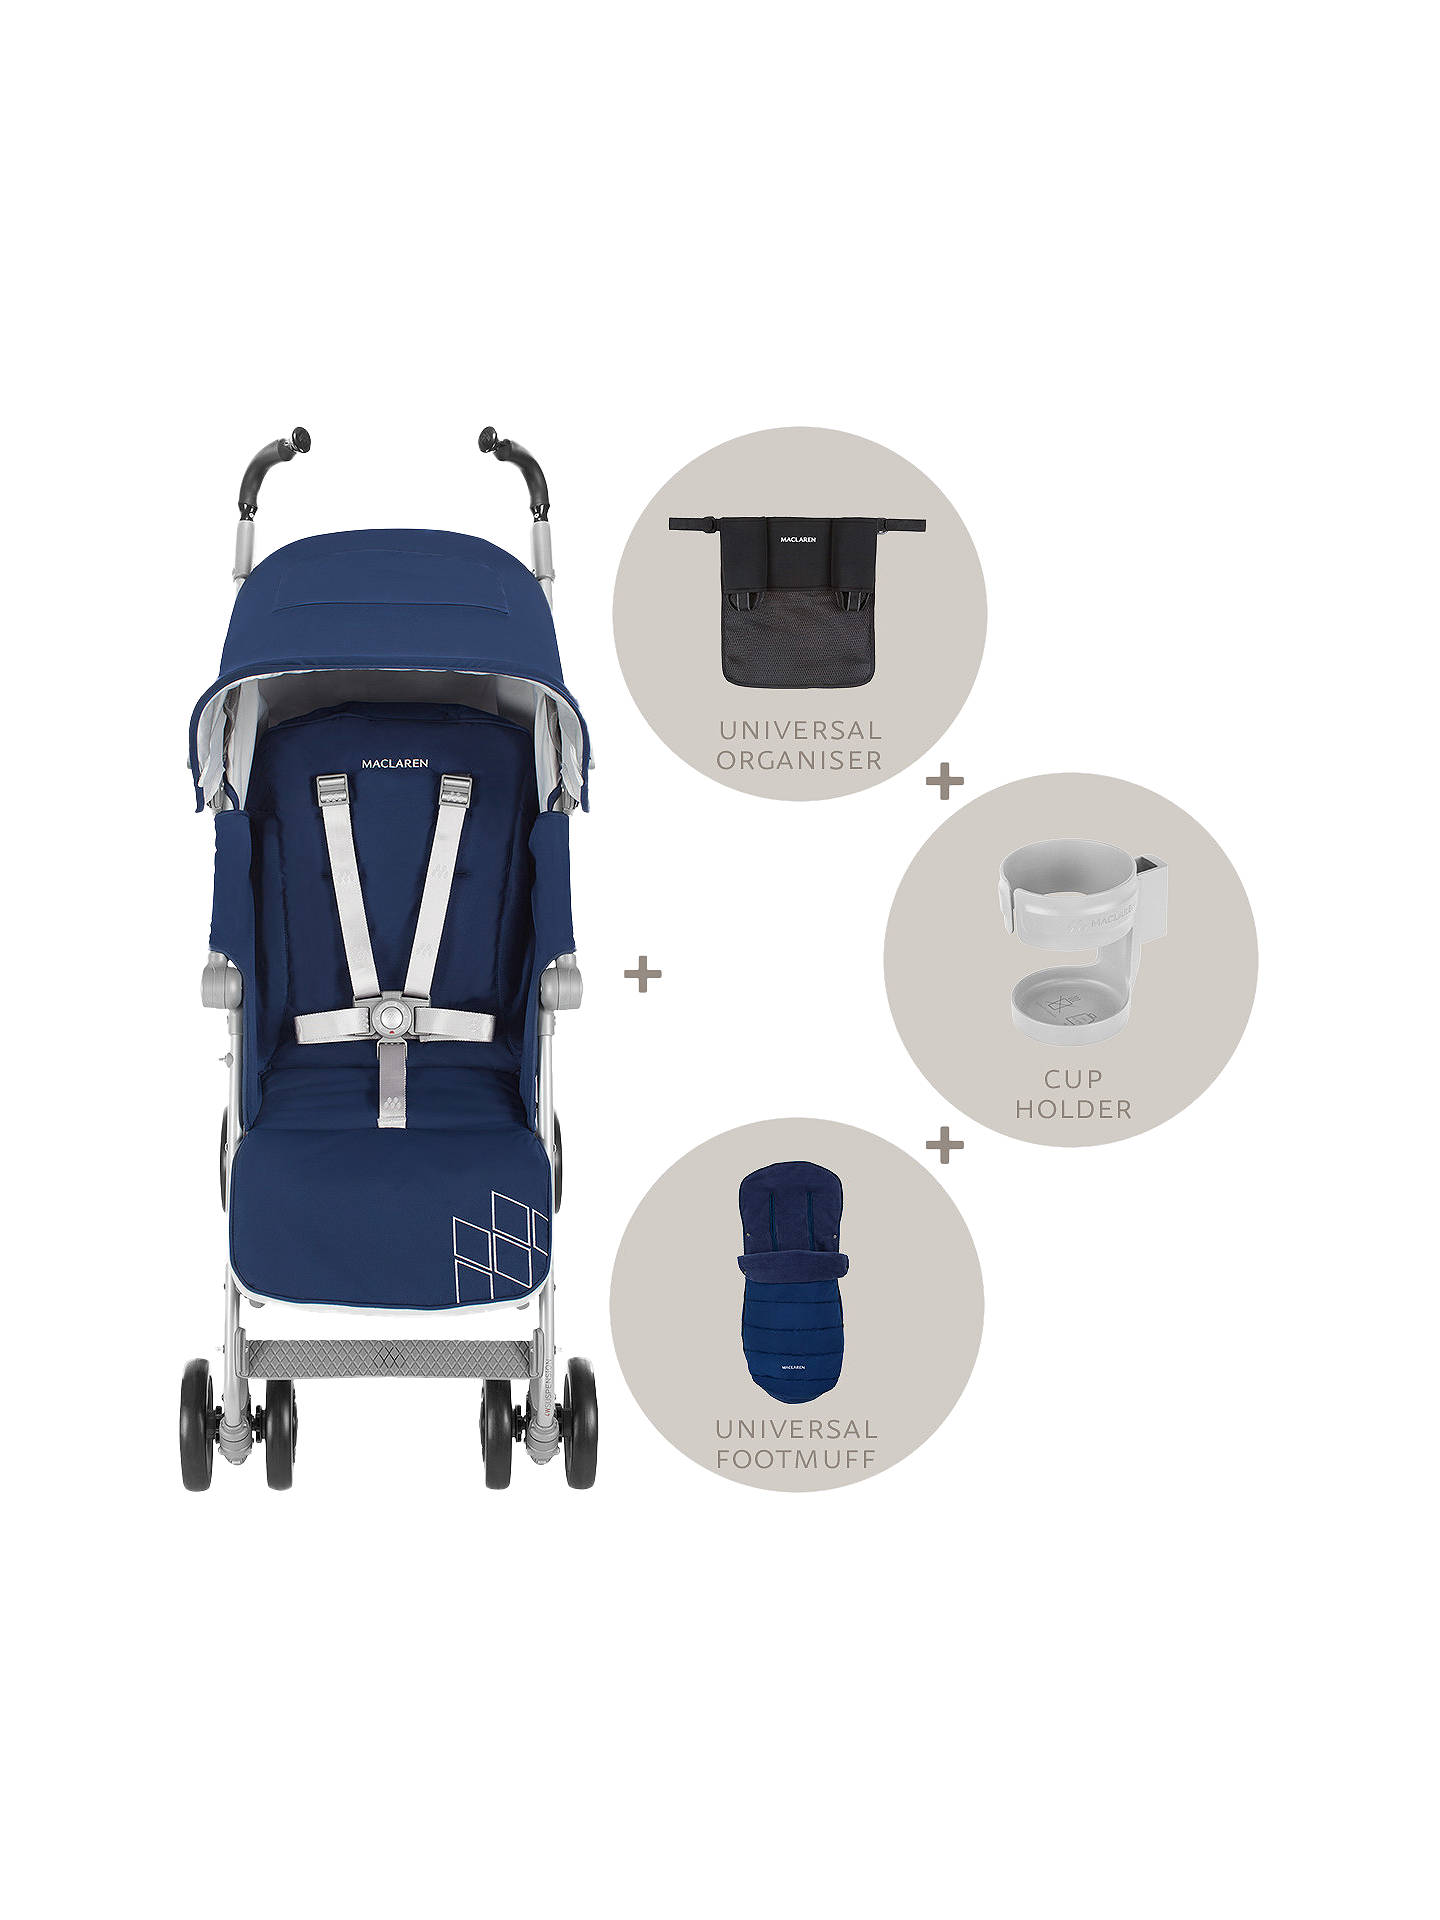 Maclaren Techno Xt Winter Style Stroller Set Blue At John Lewis